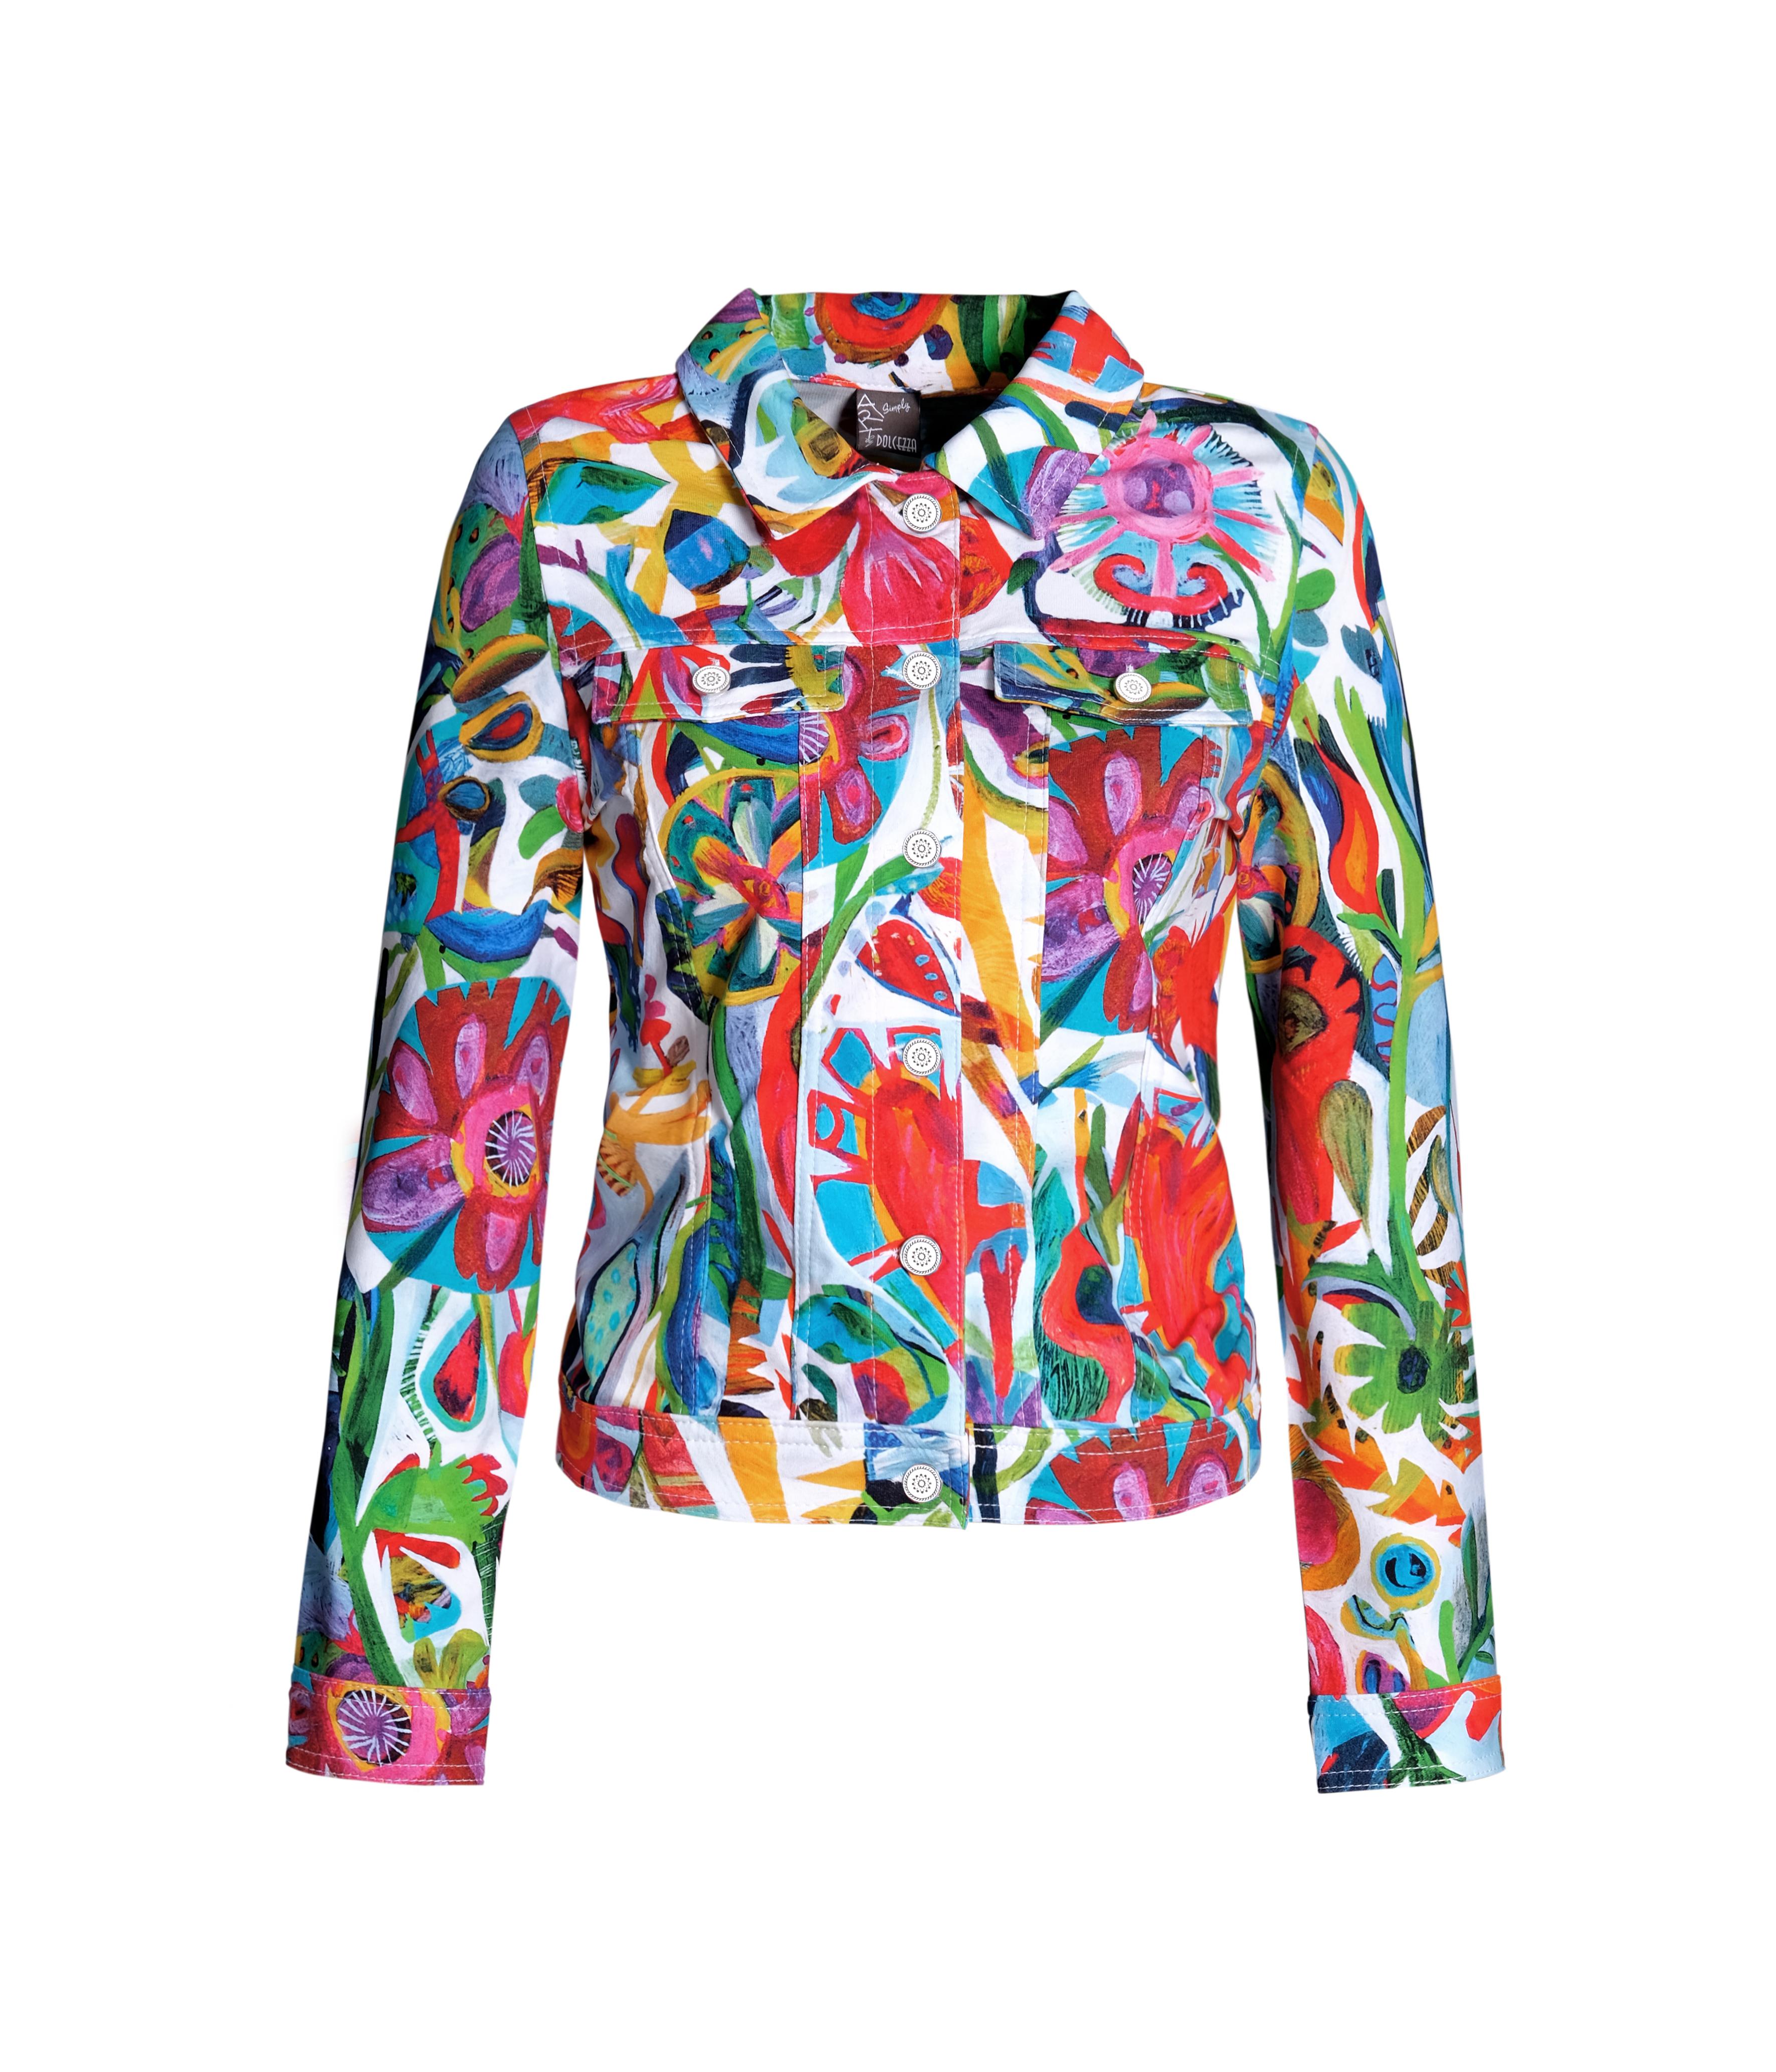 Simply Art Dolcezza: Flower Heart Abstract Art Soft Denim Jacket (Few Left!) DOLCEZZA_SIMPLYART_21629